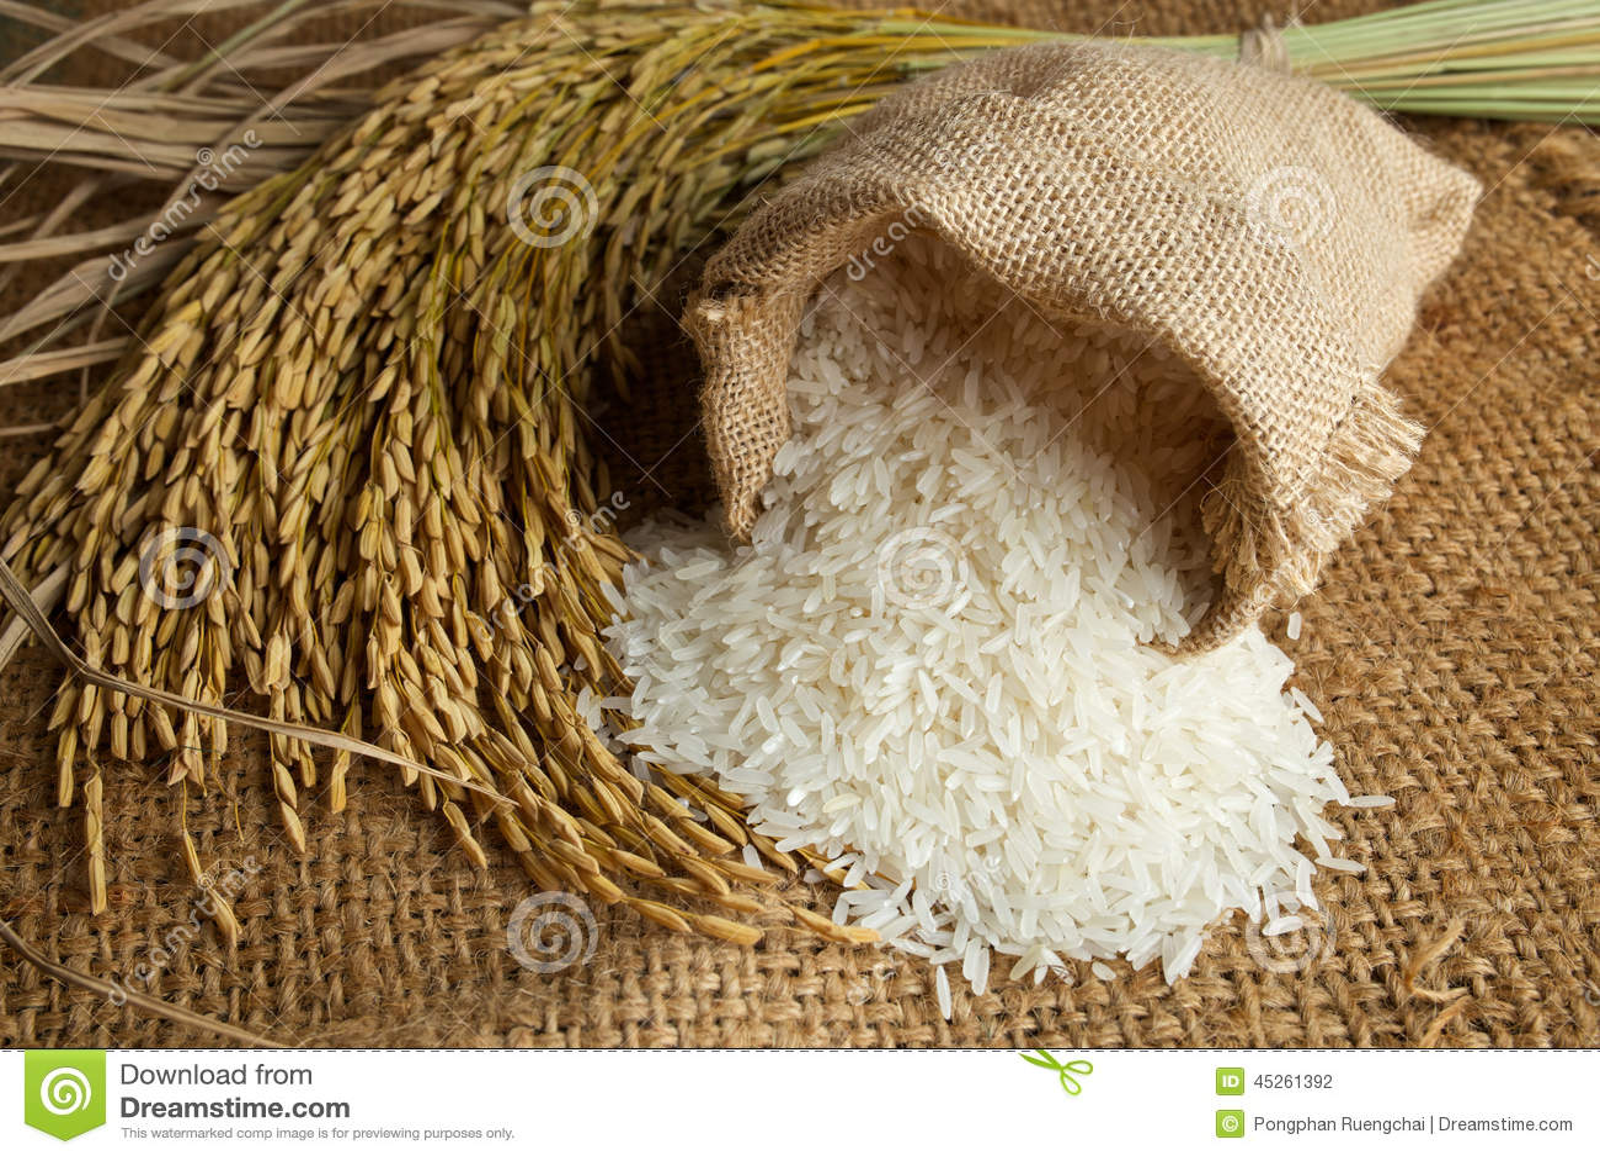 Rice i burlapsäck